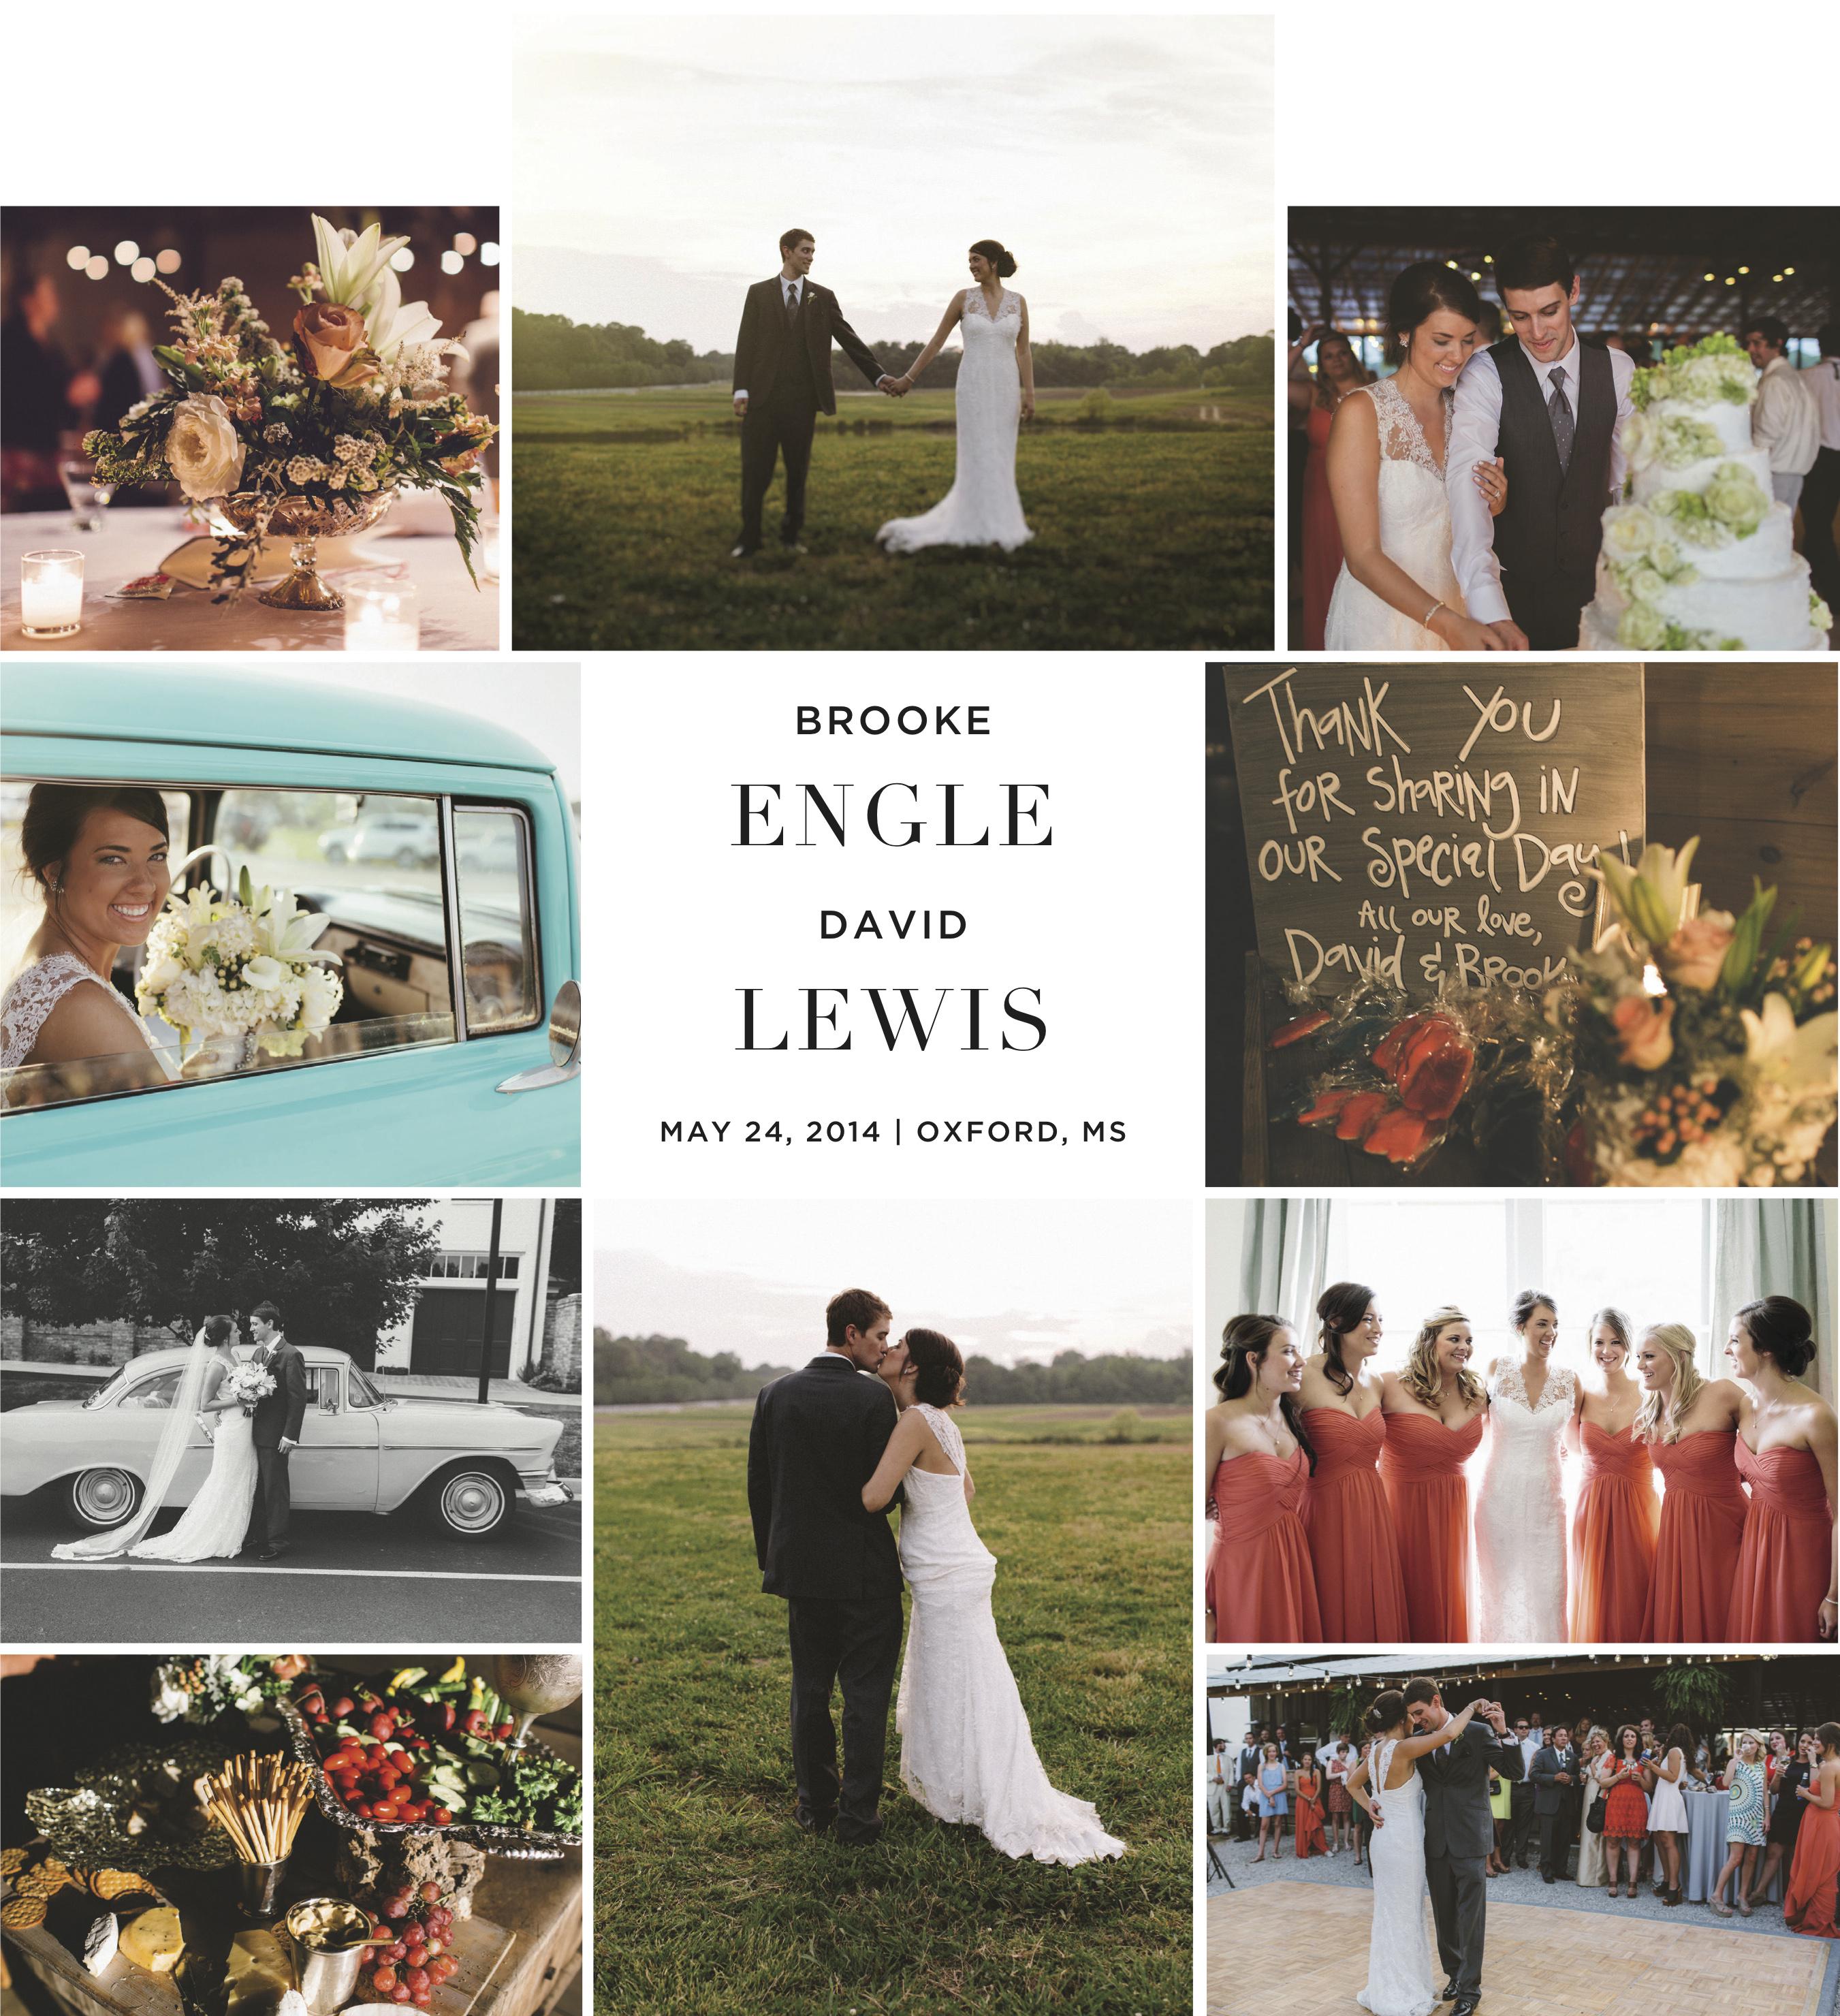 Friday's Featured Wedding: Brooke Manning Engle & David